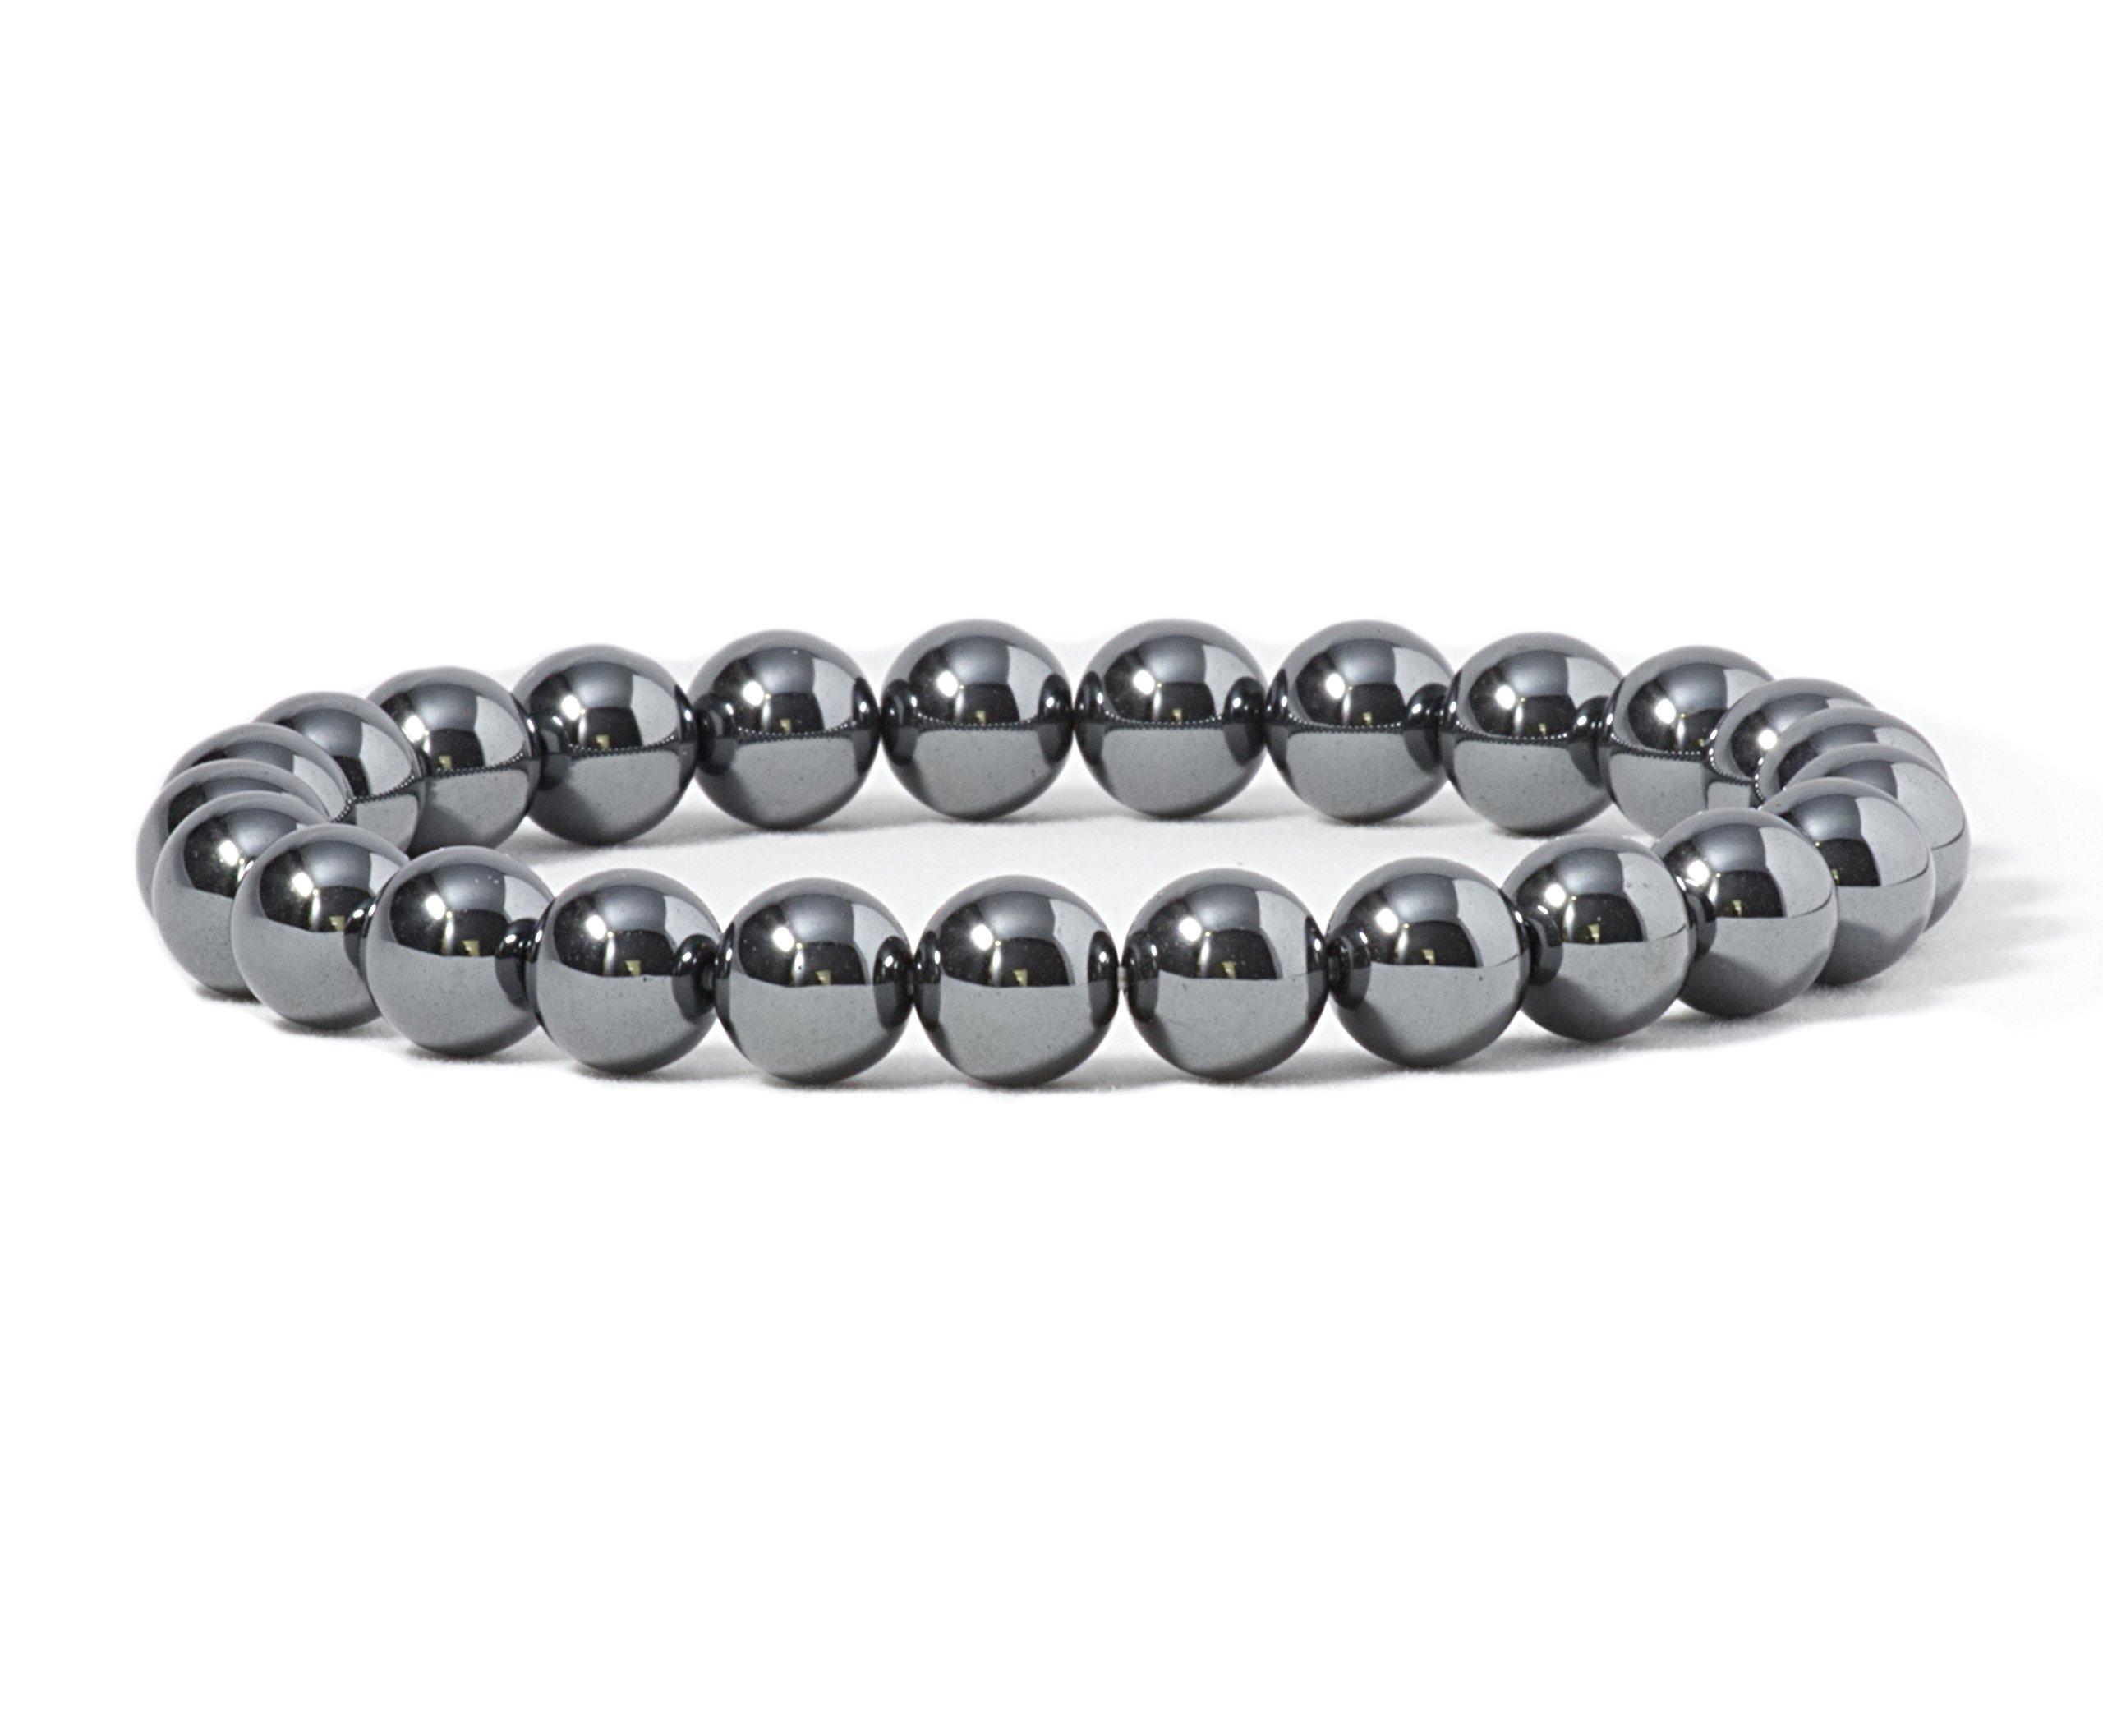 Cherry Tree Collection Gemstone Beaded Stretch Bracelet Large Sizes Medium 6mm Round Beads Small